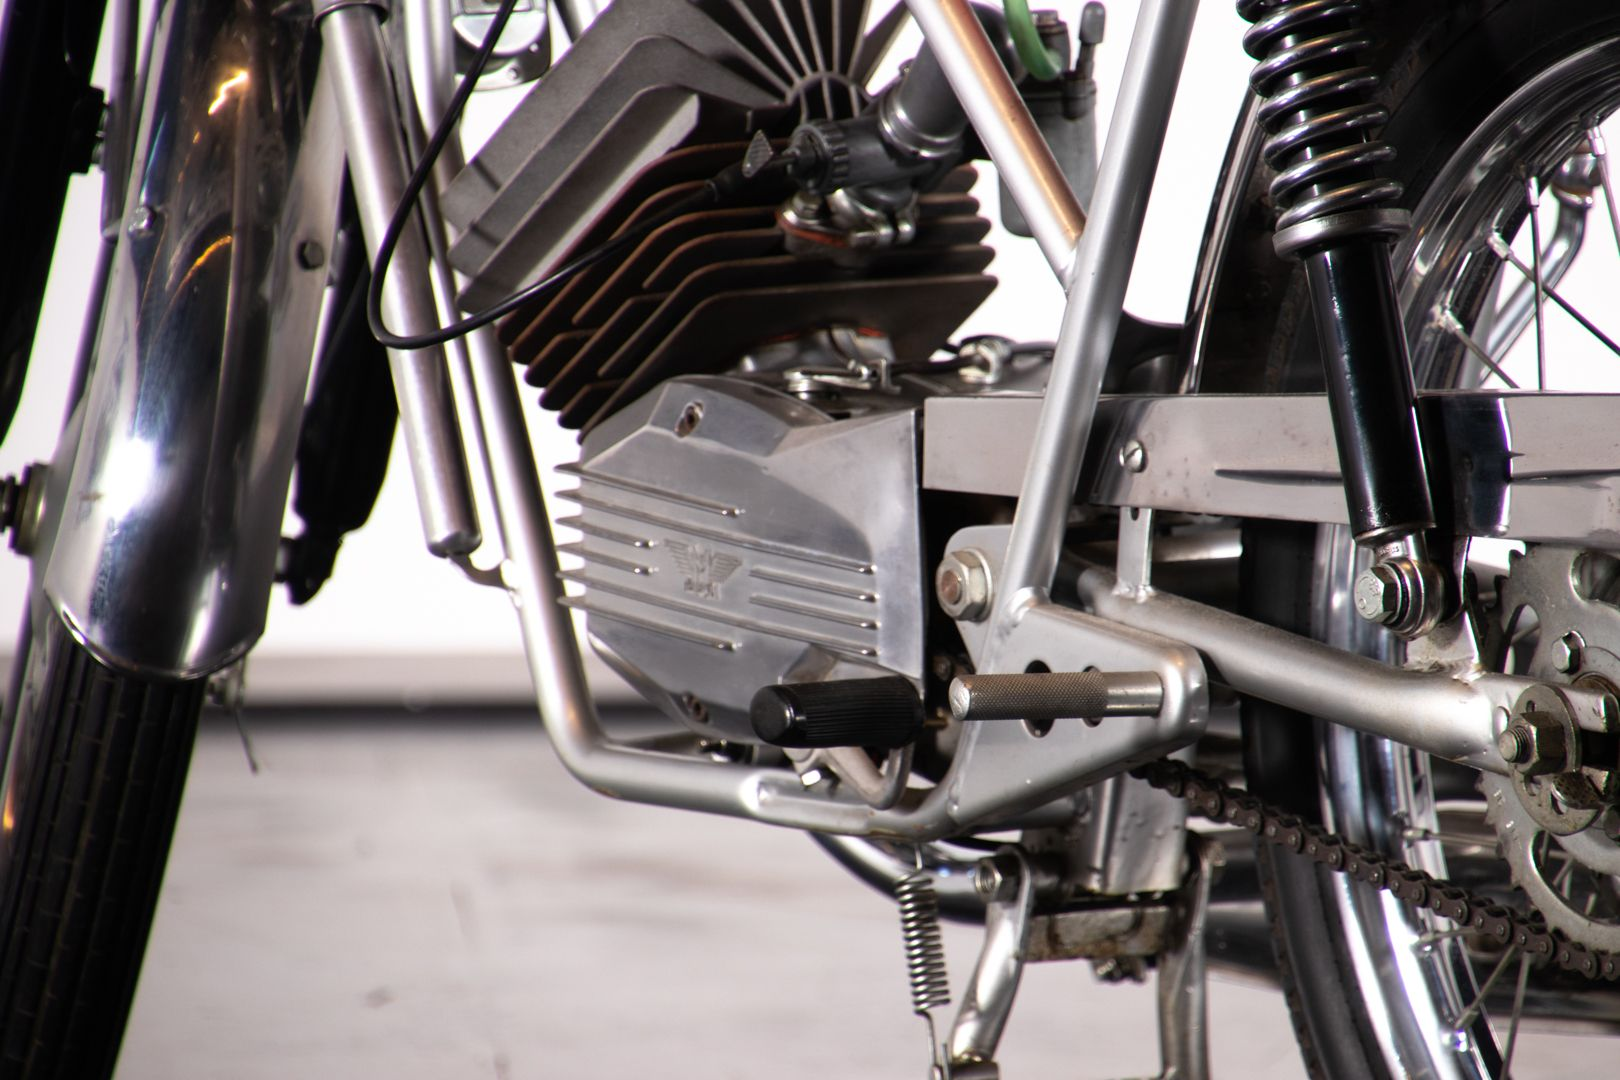 1975 Malanca DTR 49152